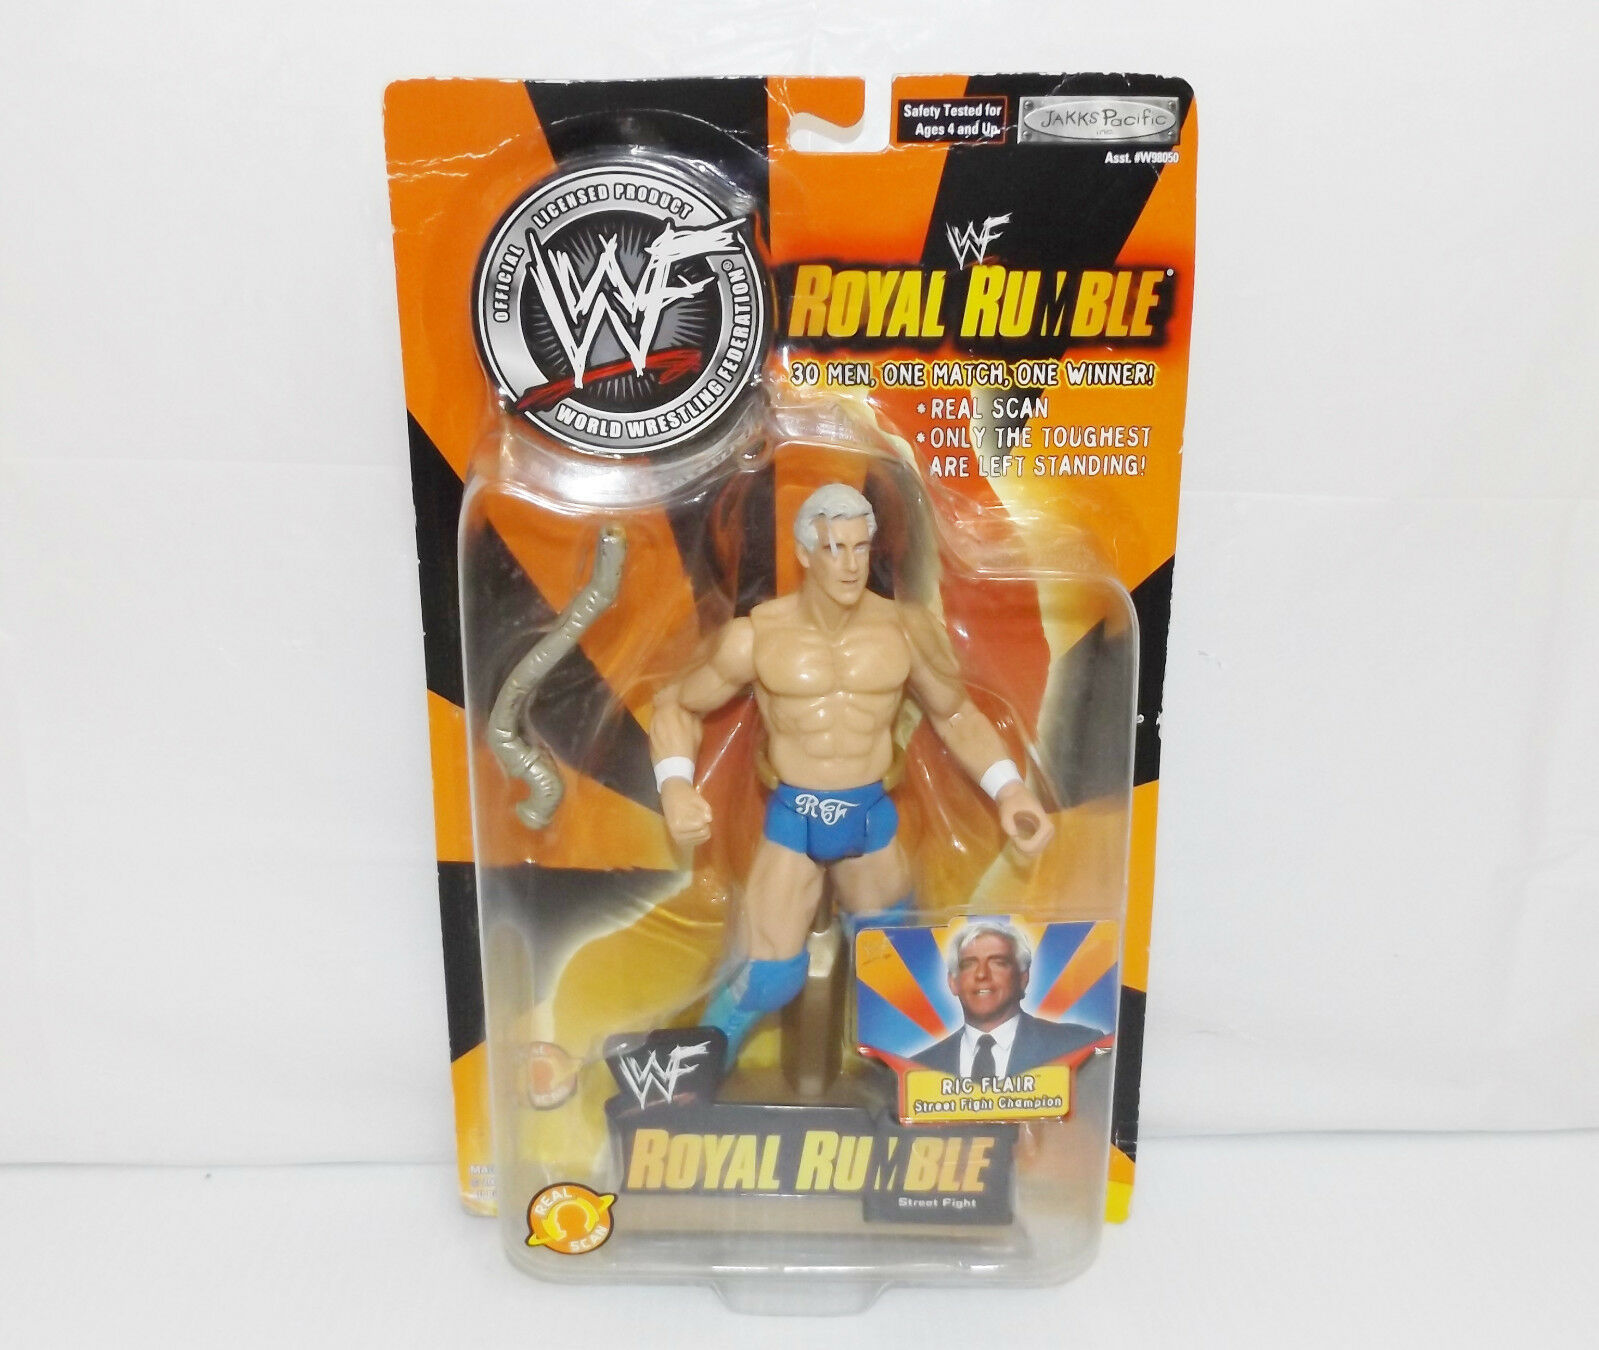 "New! 2002 Jakk's Pacific Royal Rumble ""Ric Flair"" Action Figure WWF WWE [895]"